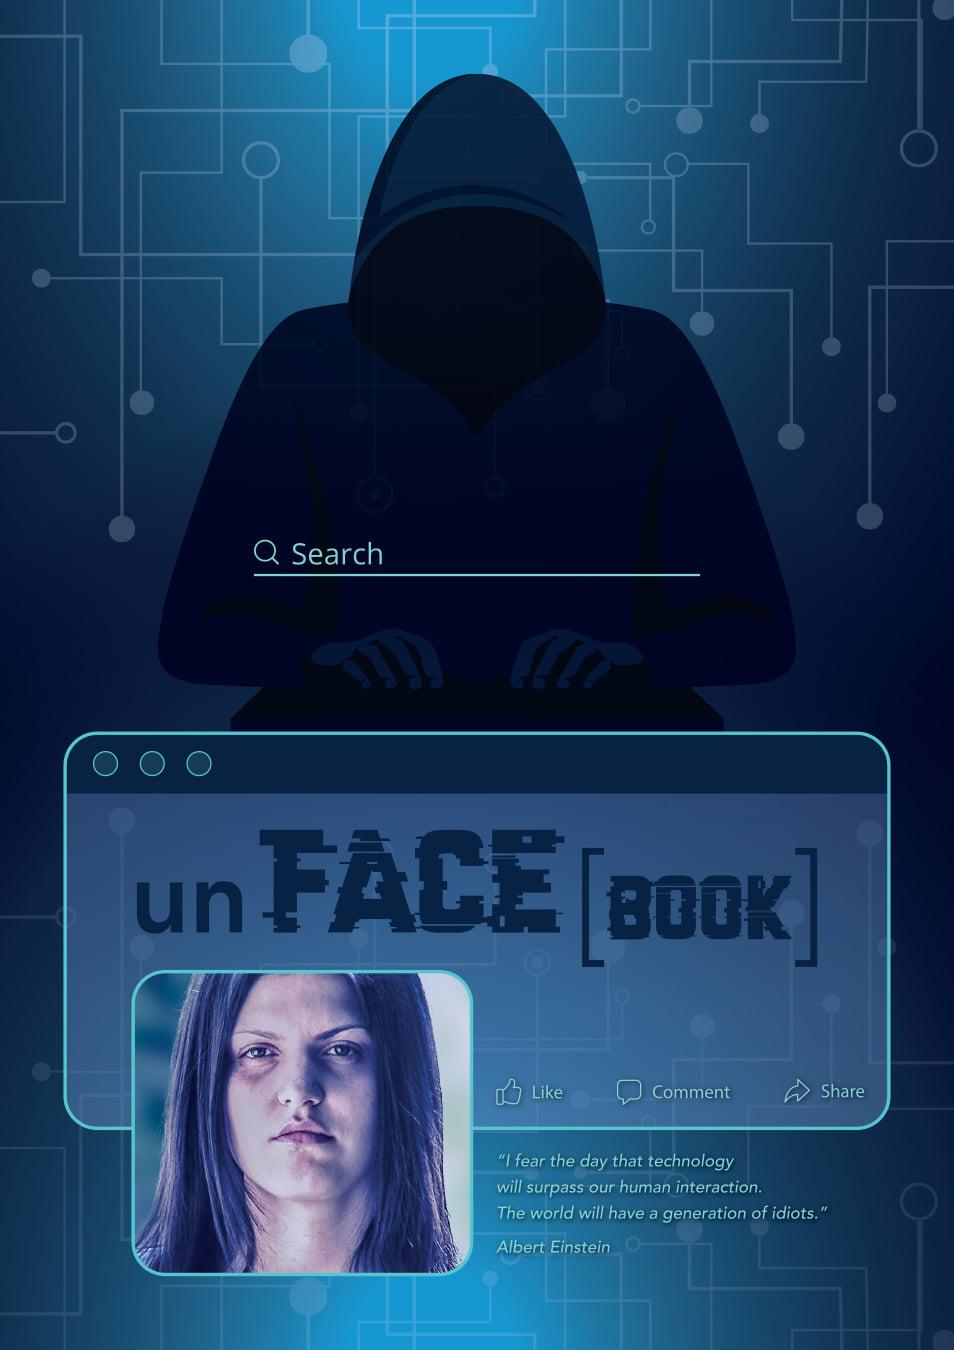 Unfacebook